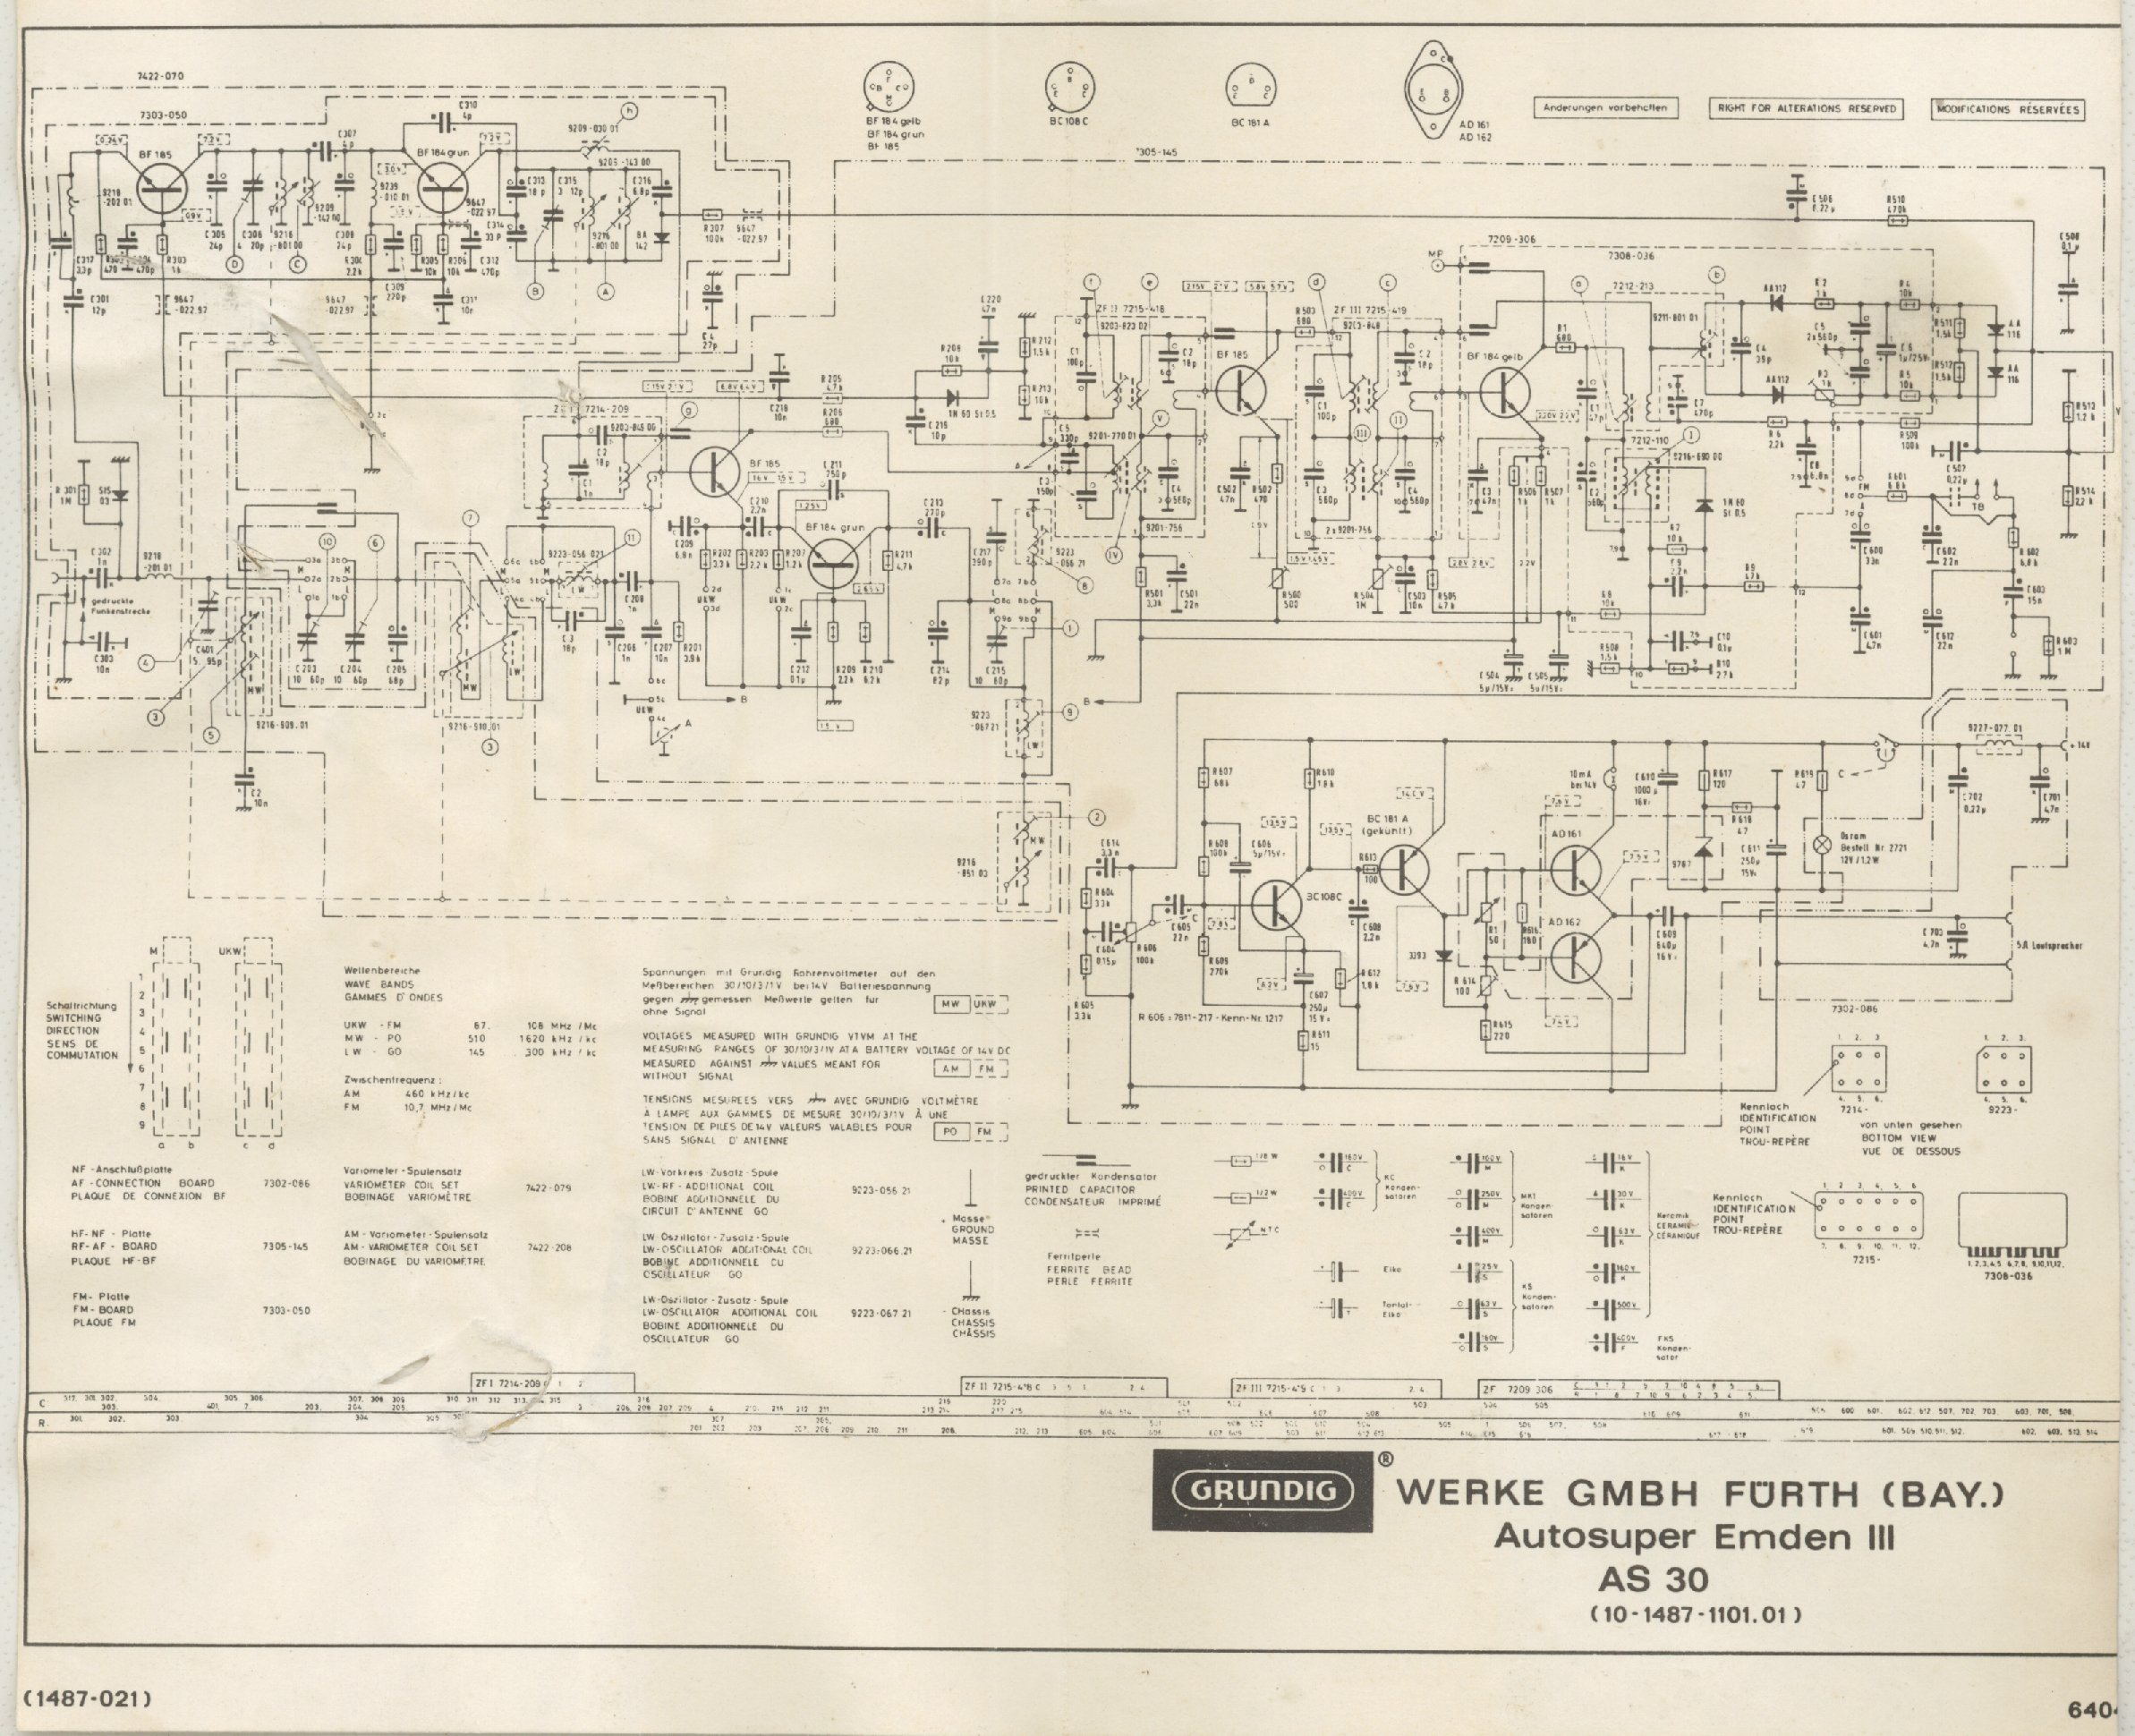 Enchanting Site Schematic Sketch - Electrical Diagram Ideas ...